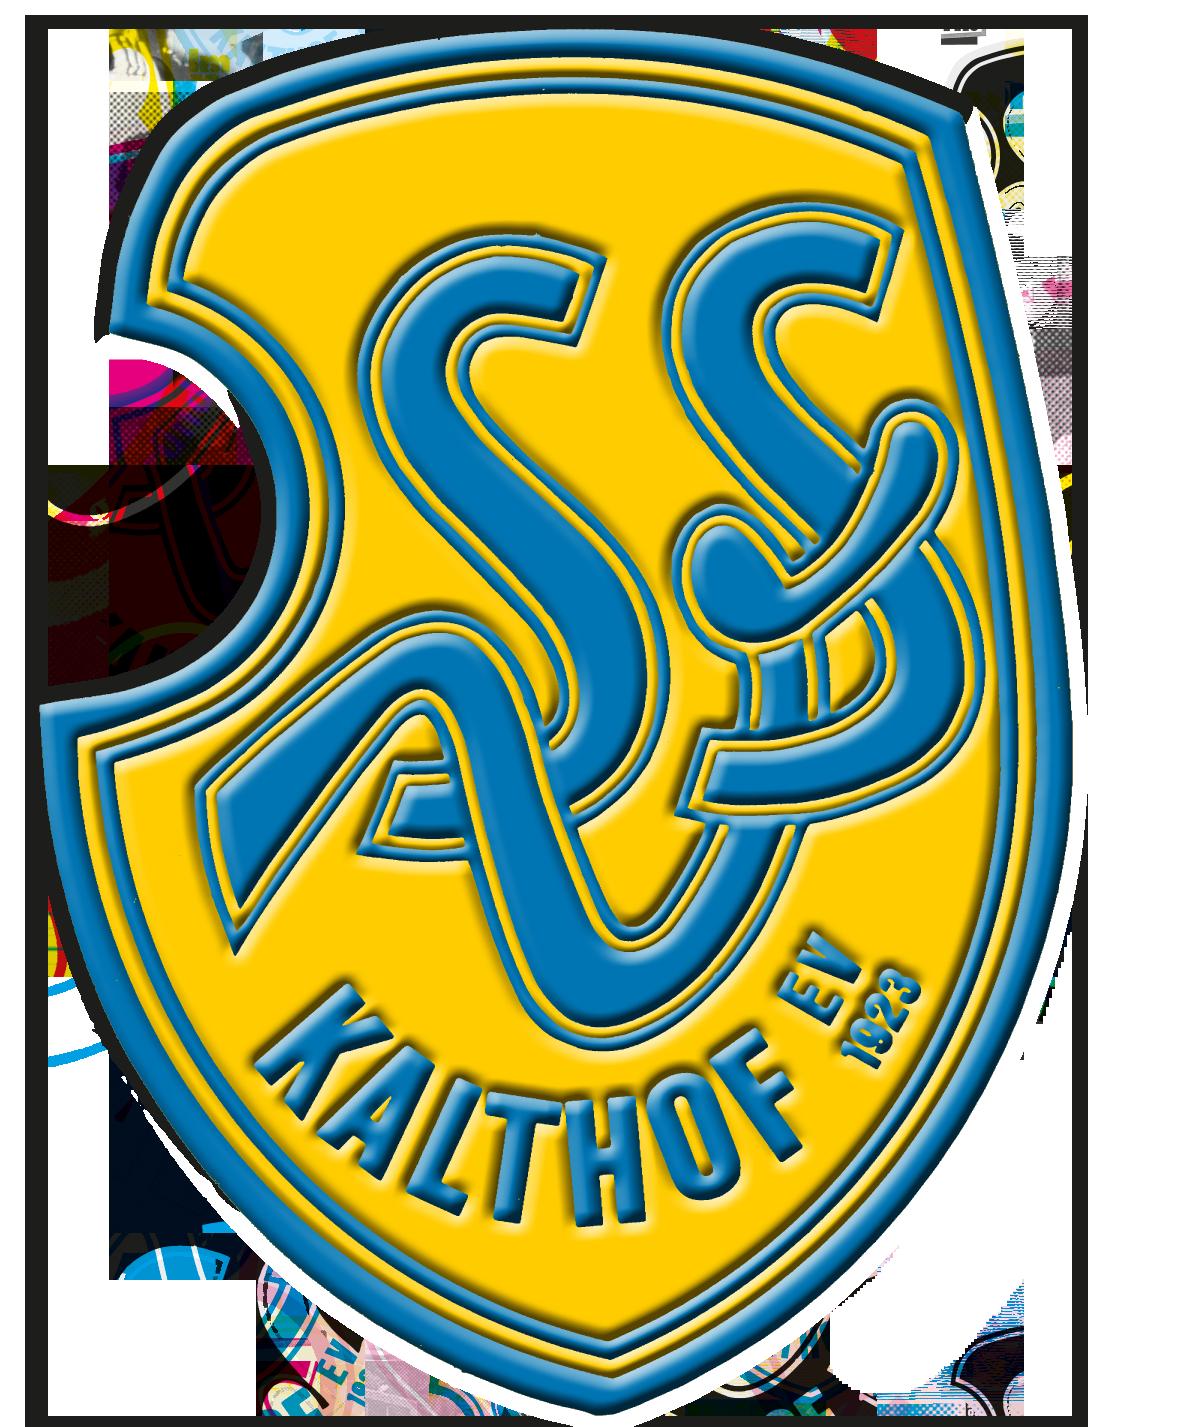 Kalthof